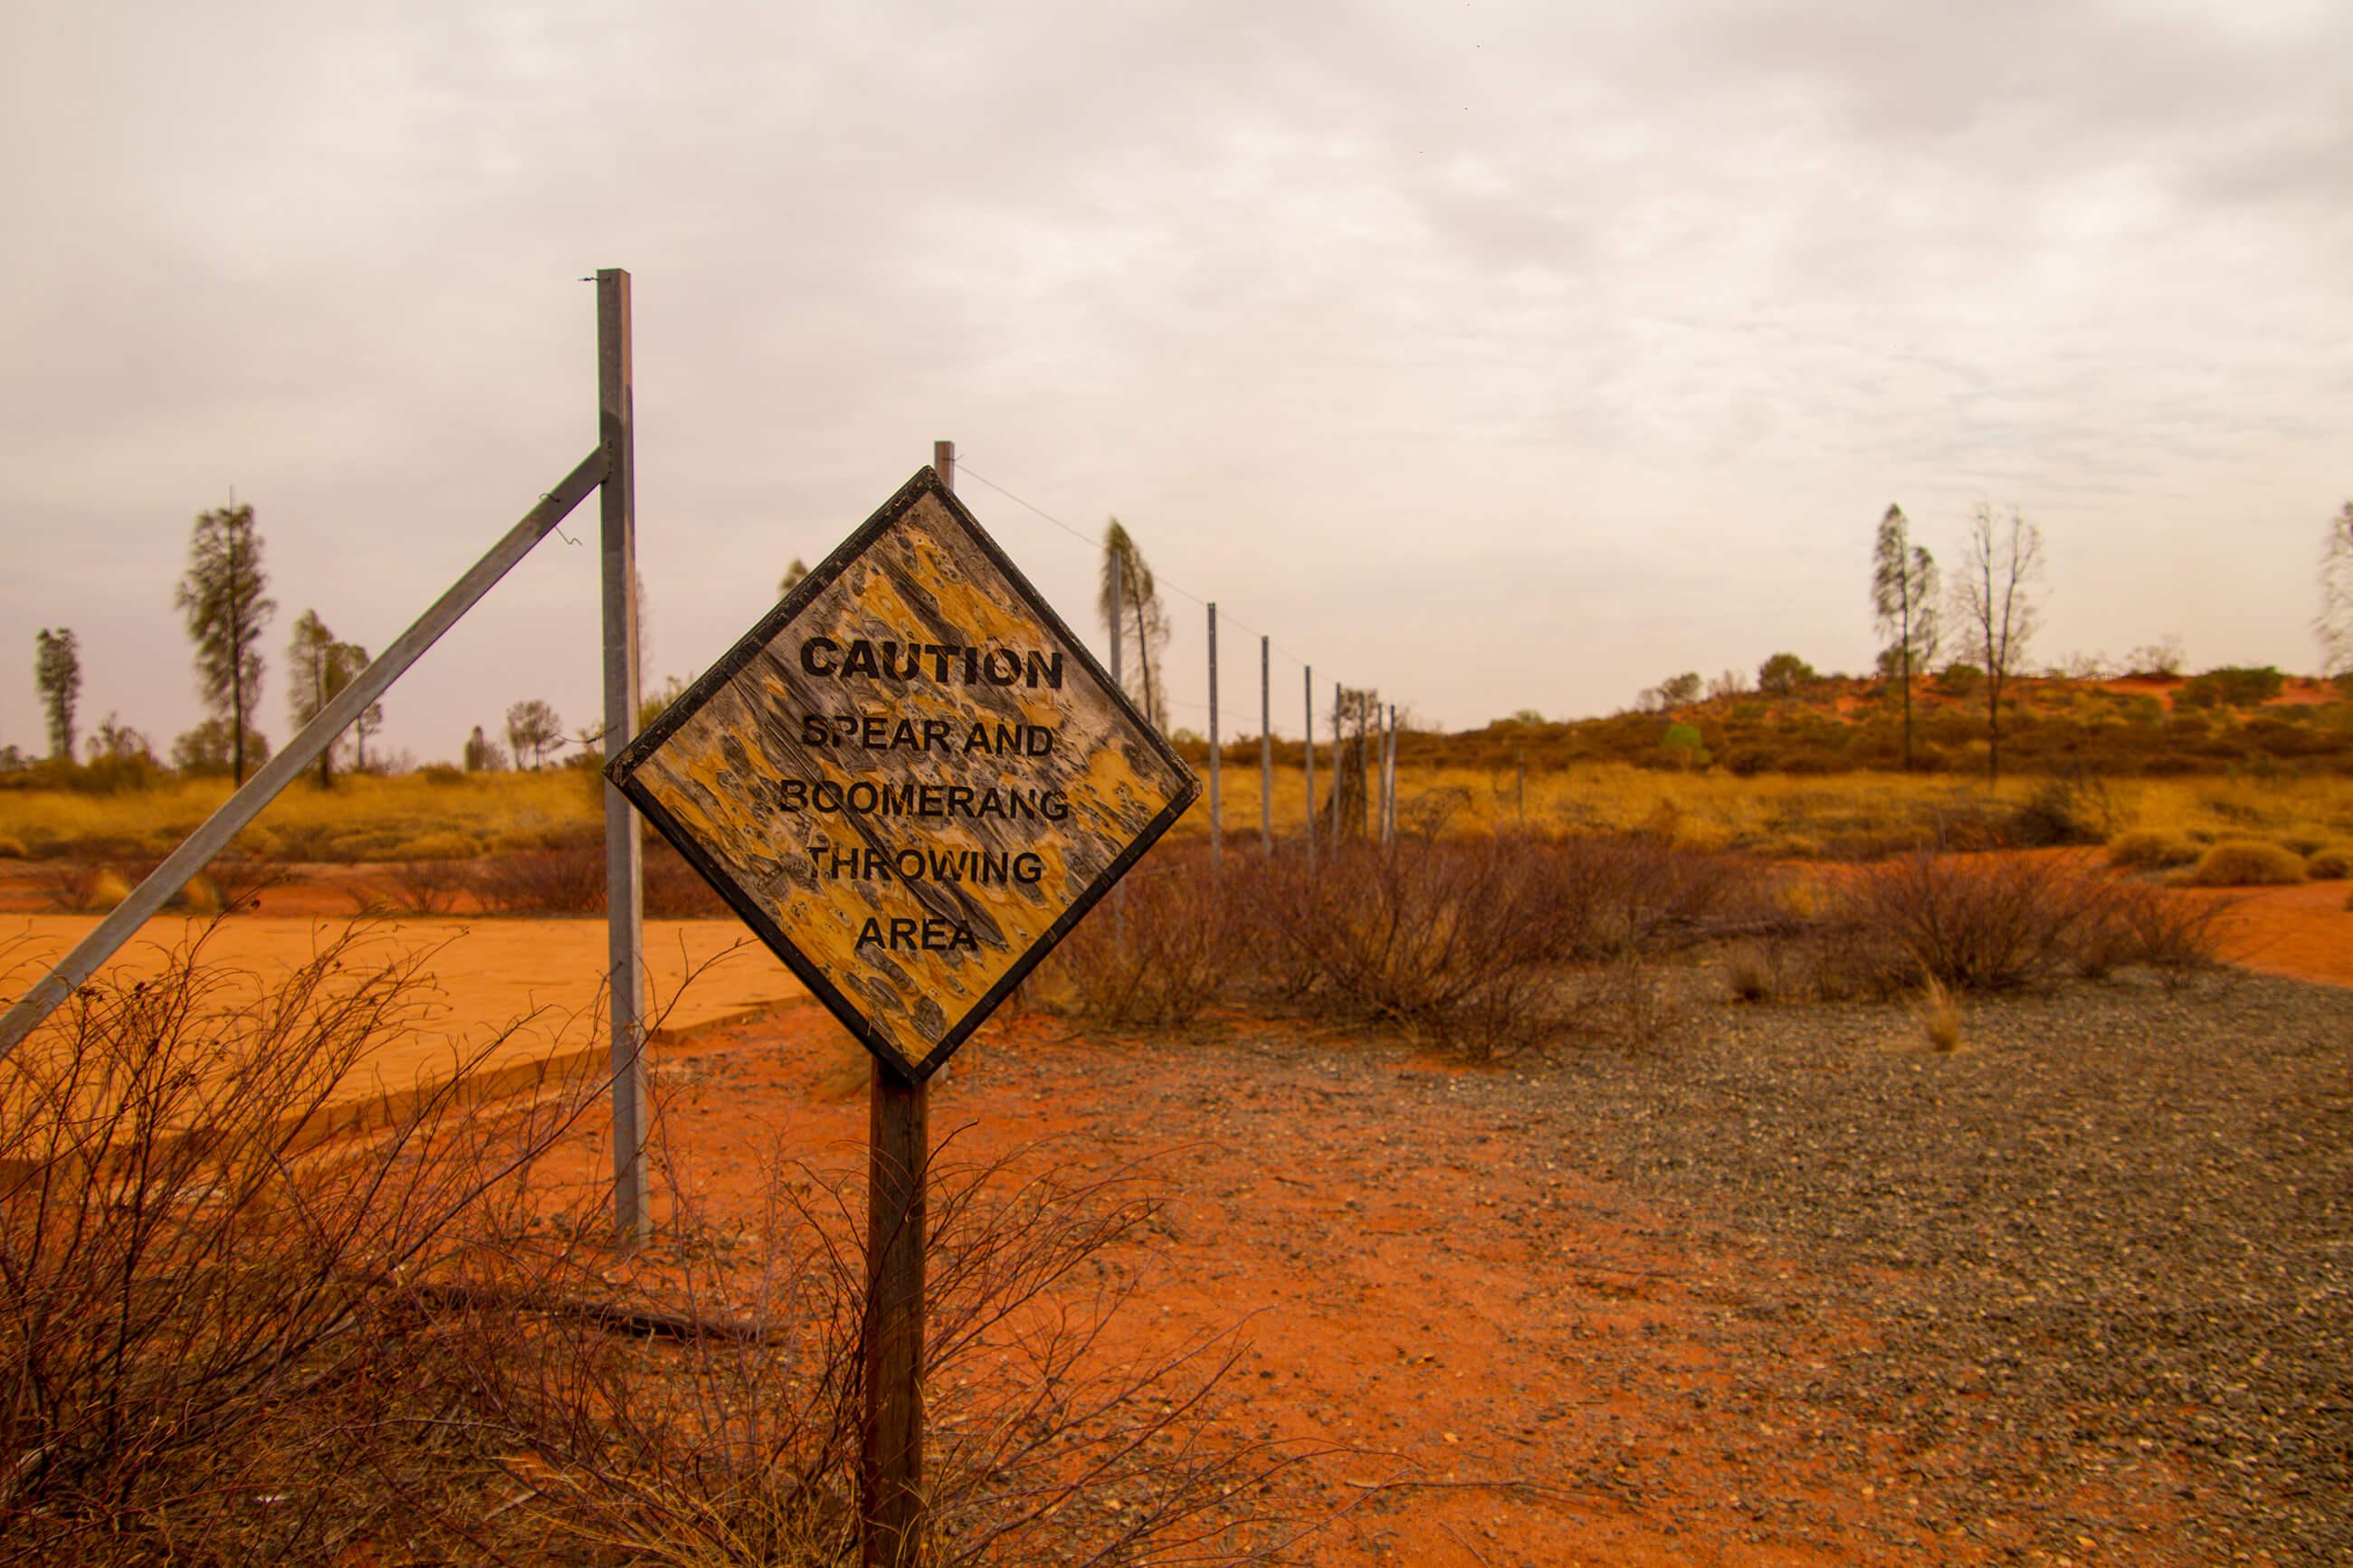 https://bubo.sk/uploads/galleries/7339/yulara---outback.jpg